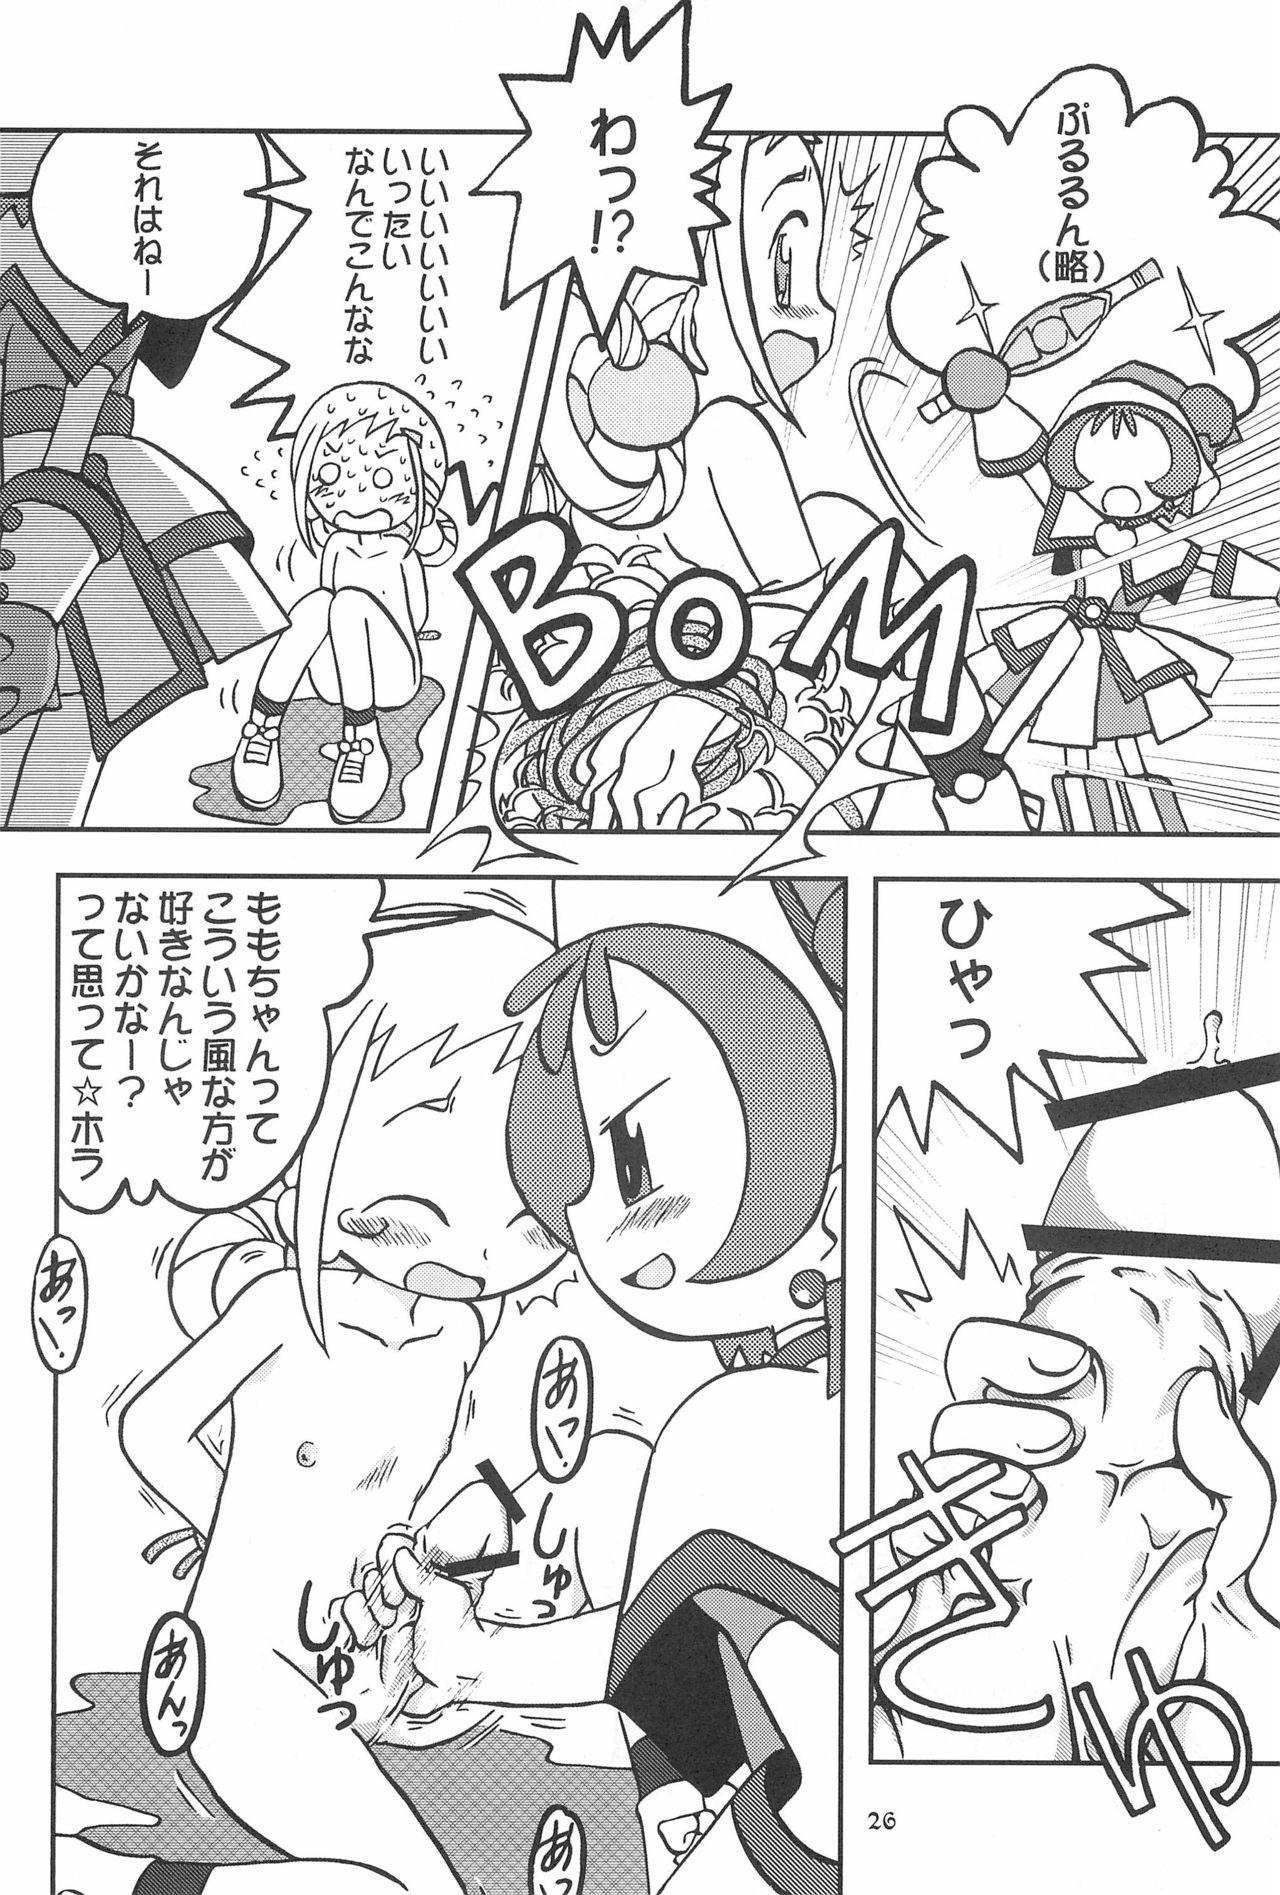 Momo no Kanzume 25